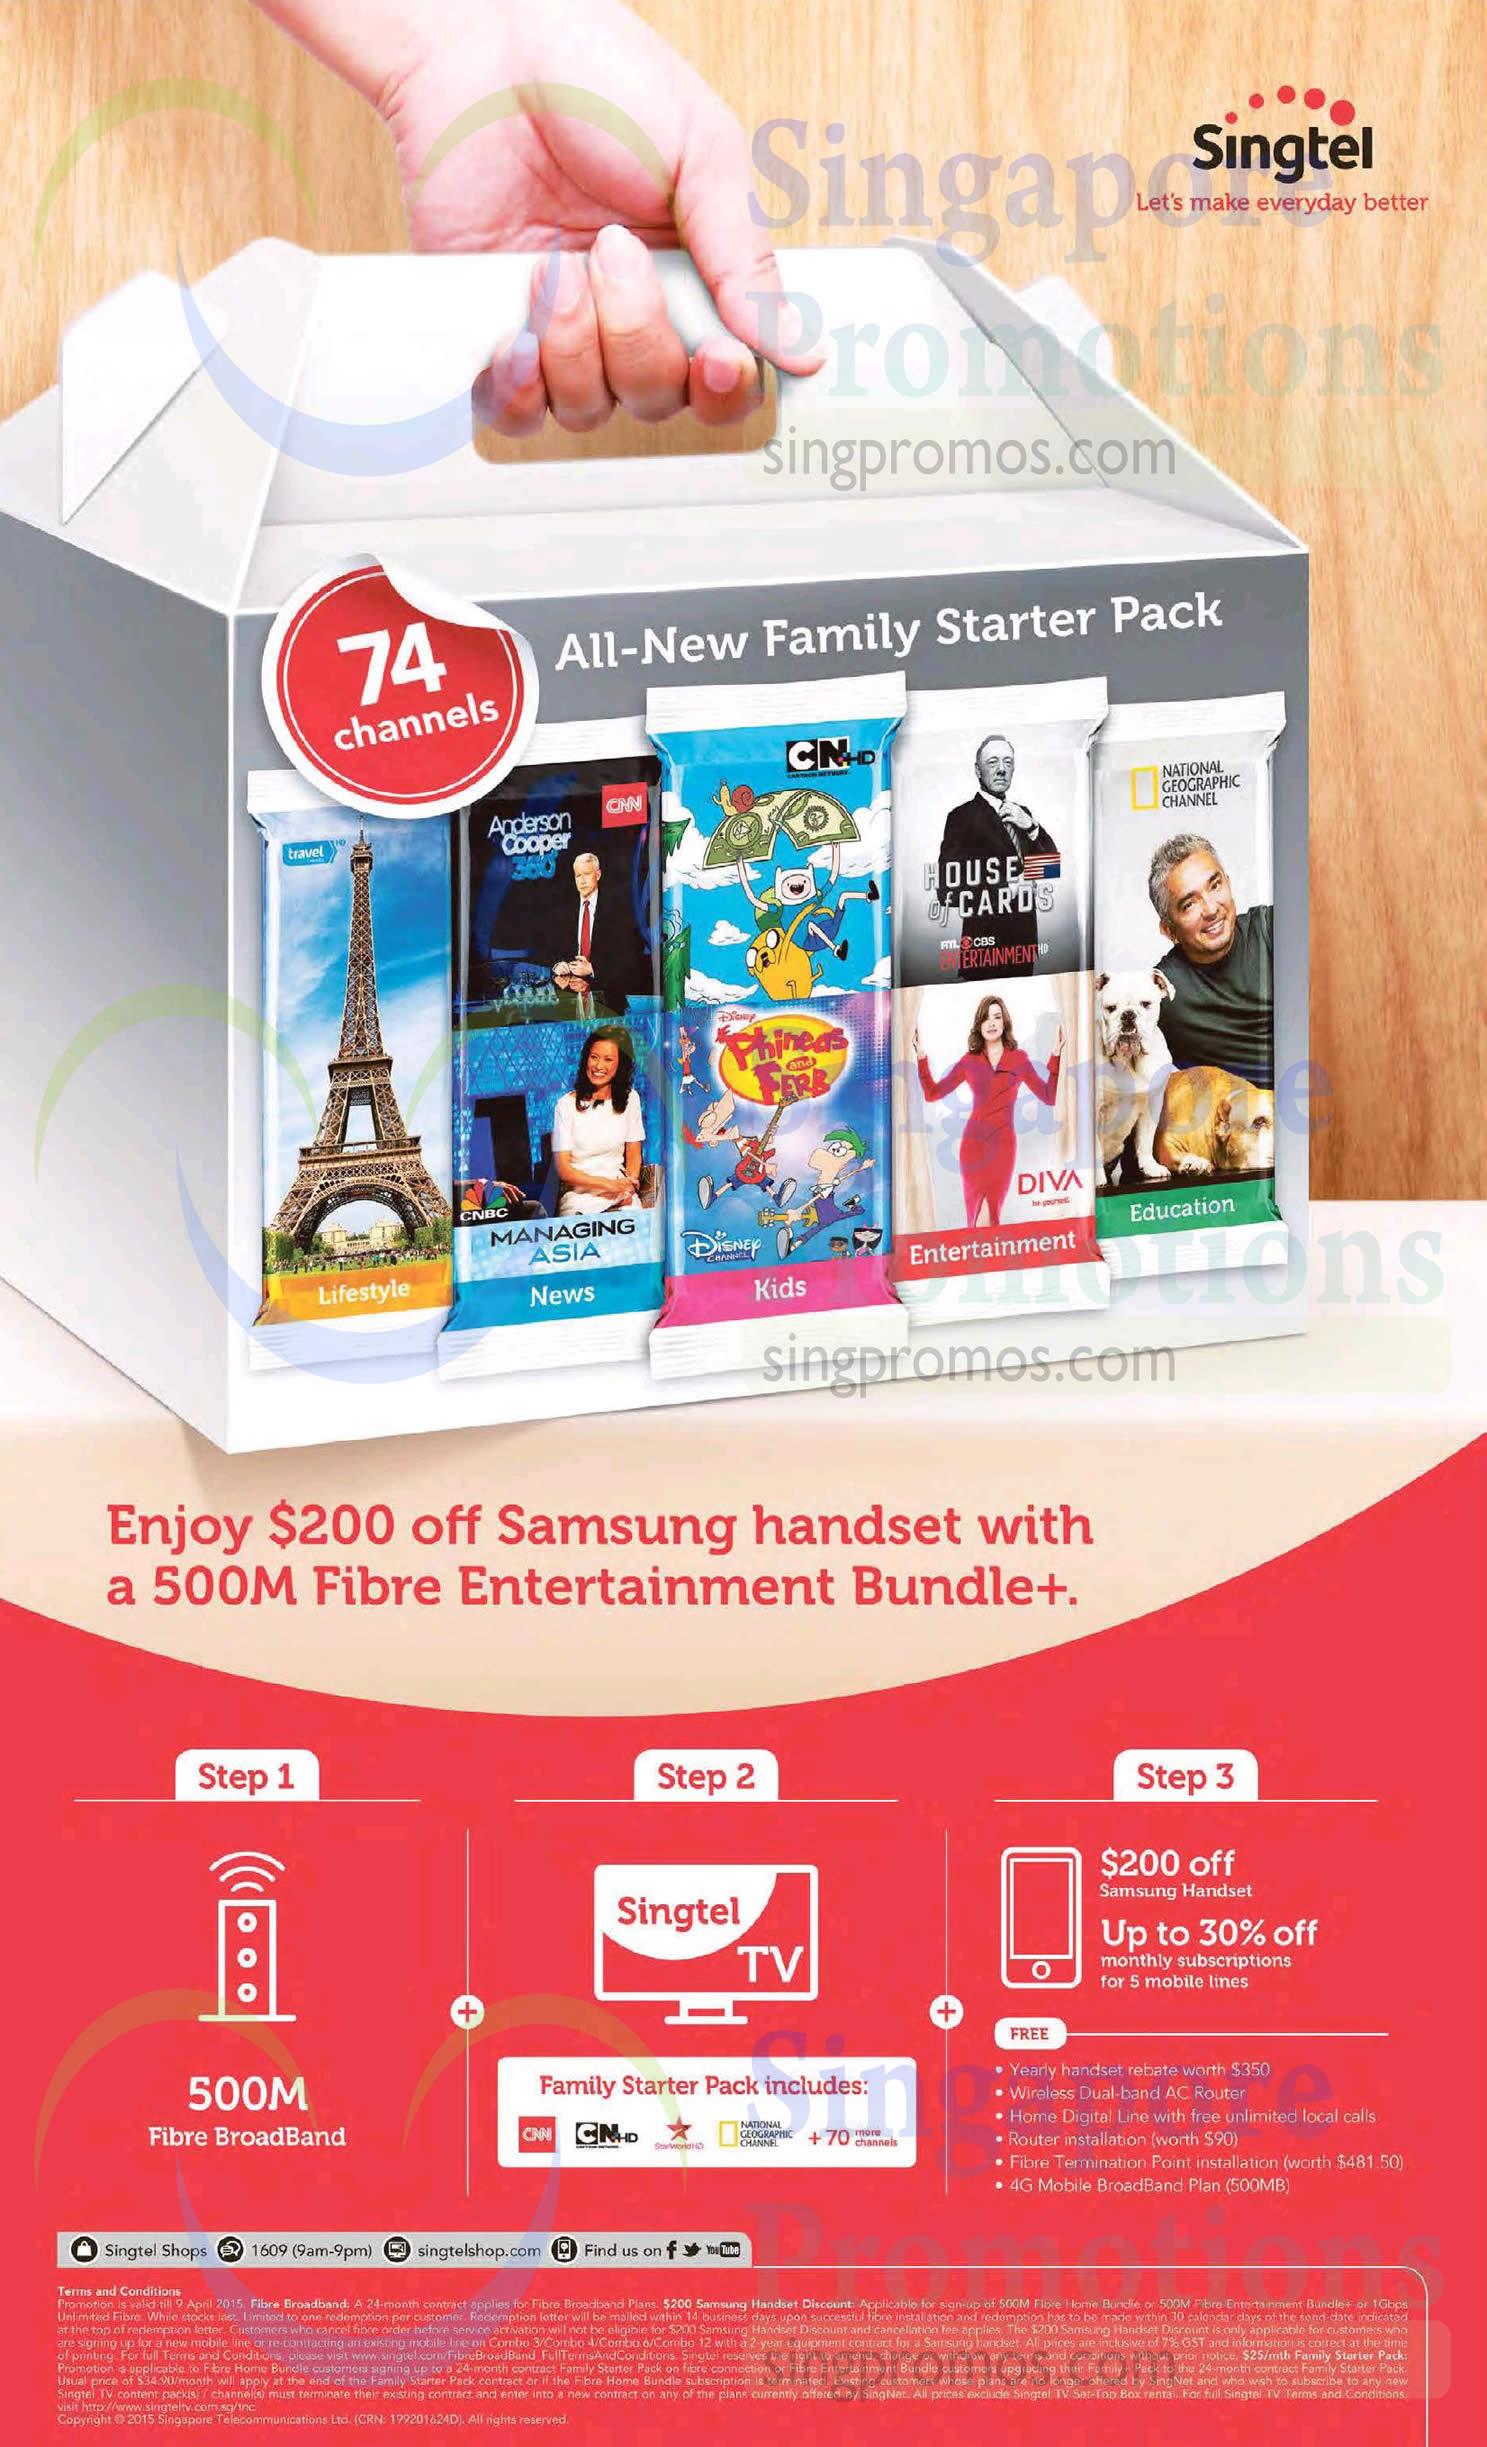 500M Fibre Entertainment Bundle 200 Dollar Off Samsung Handset